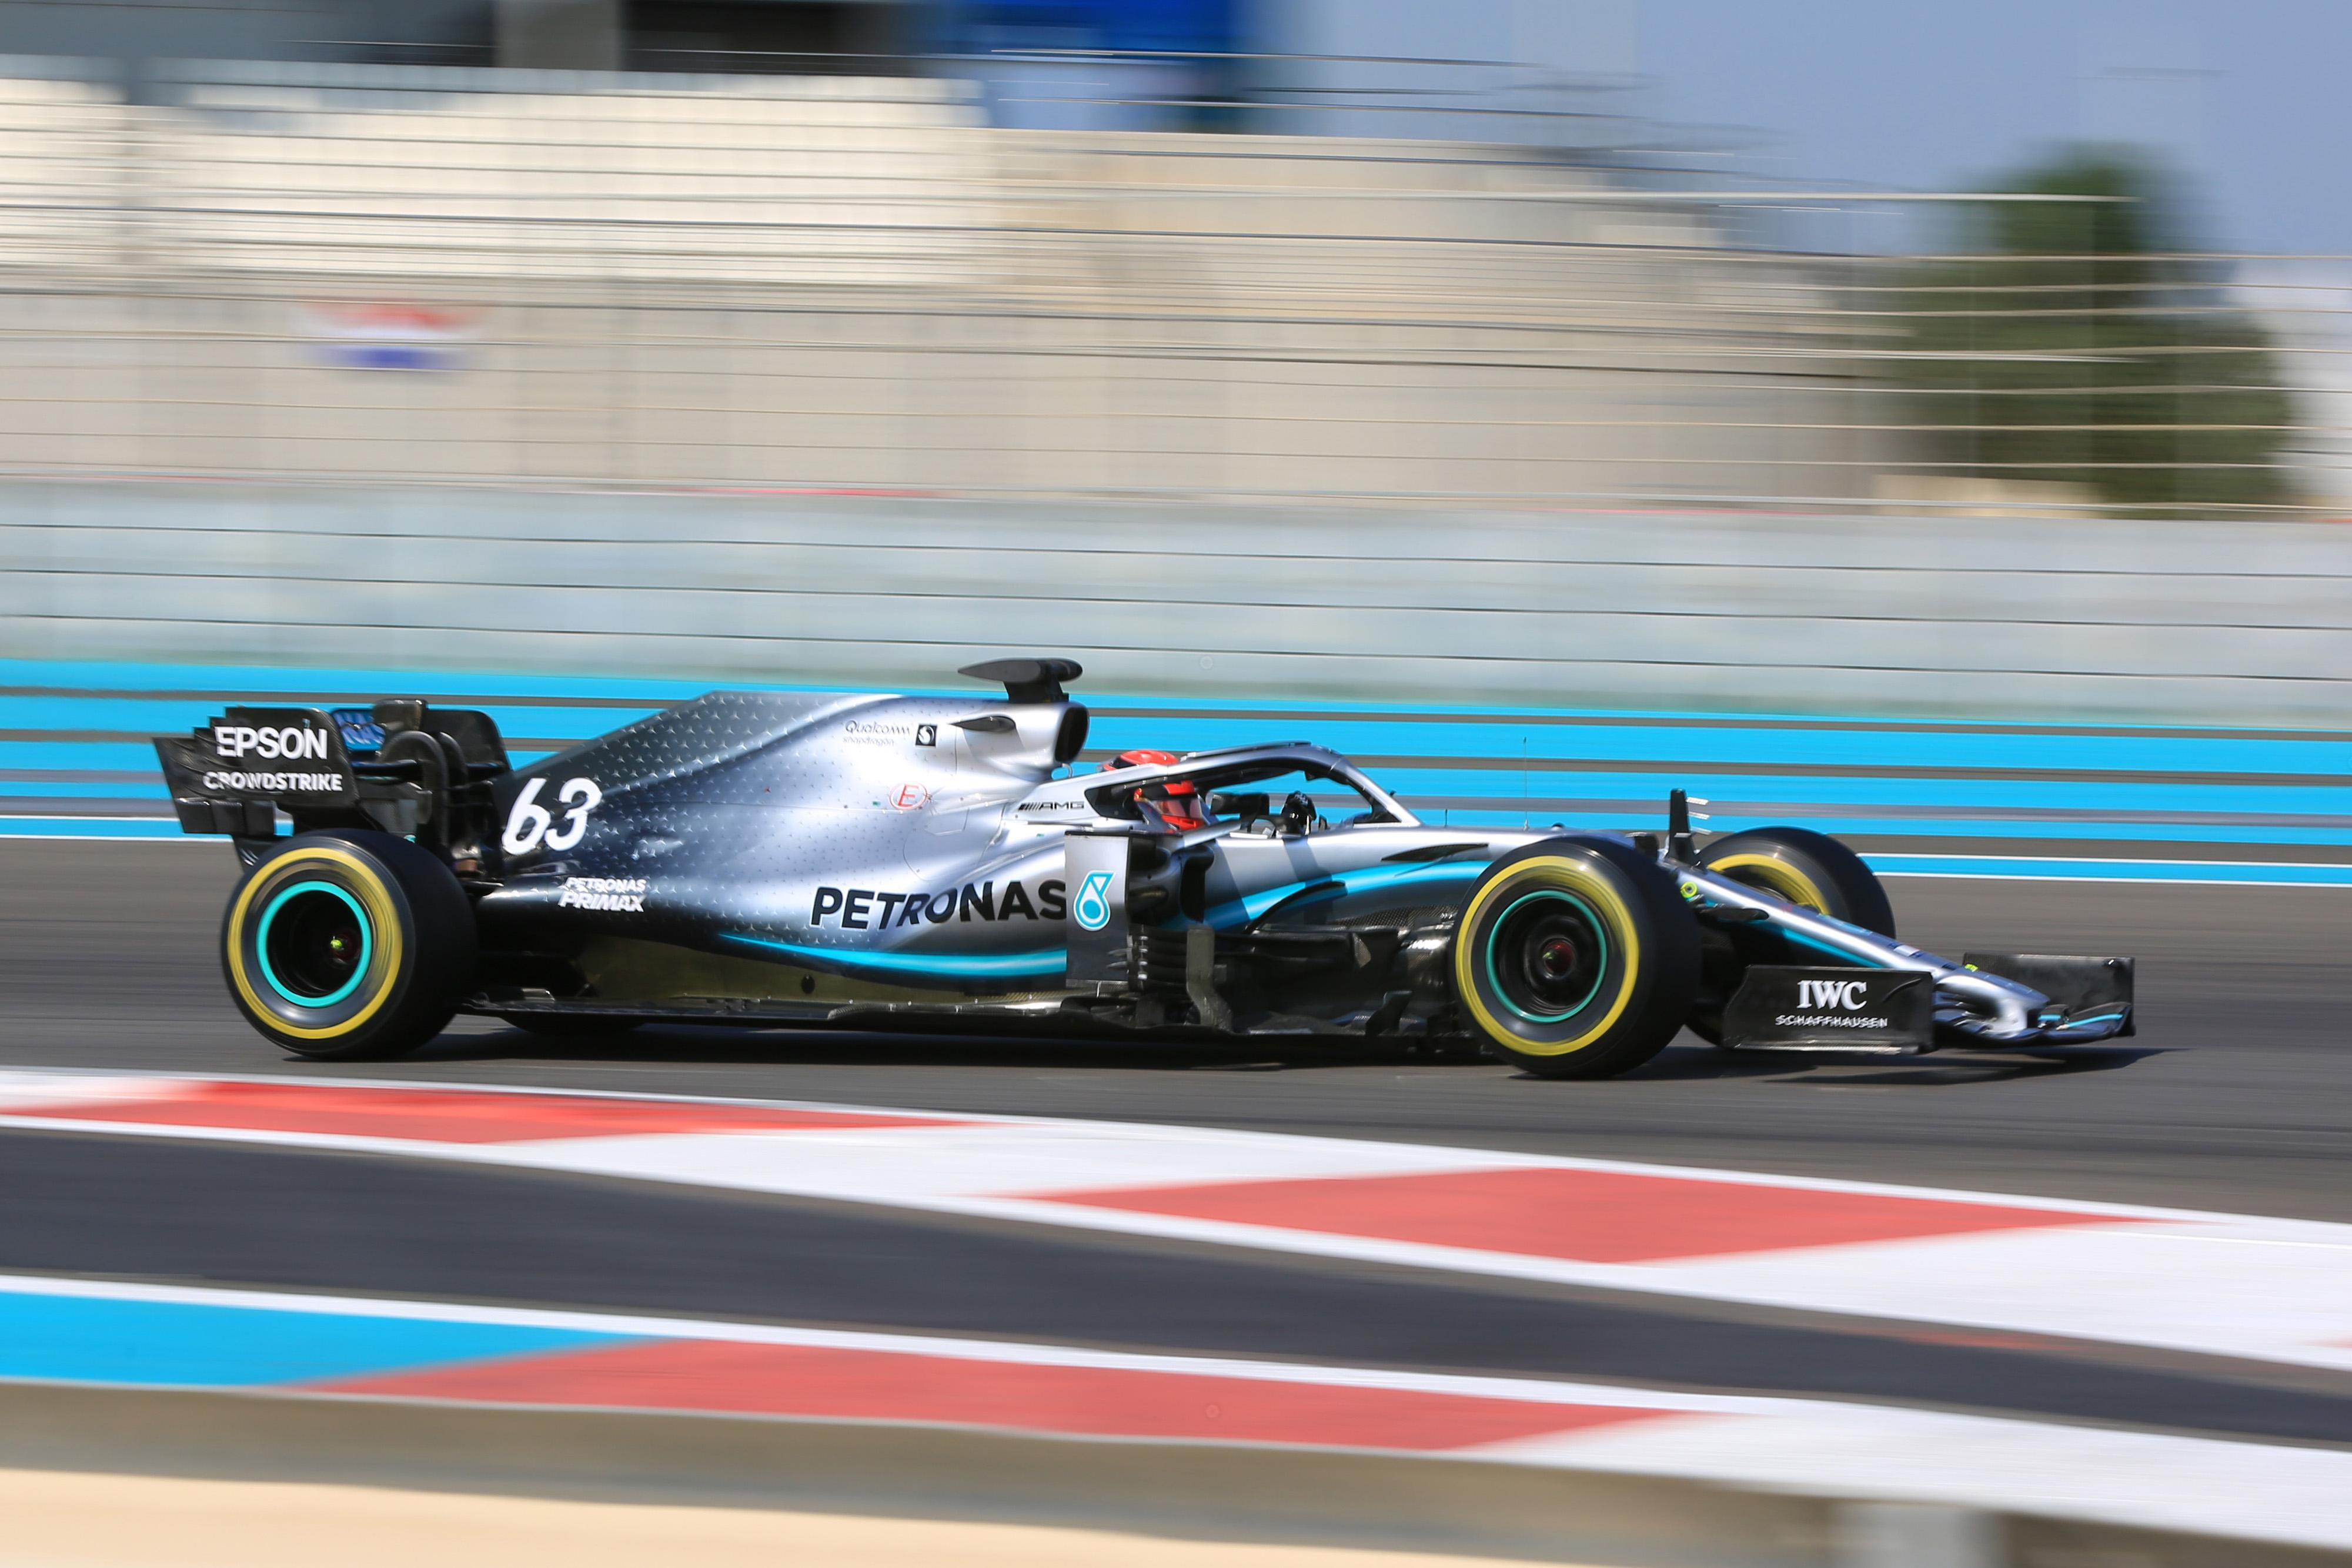 F1 Formula 1 Formula One Abu Dhabi George Russell Mercedes testing